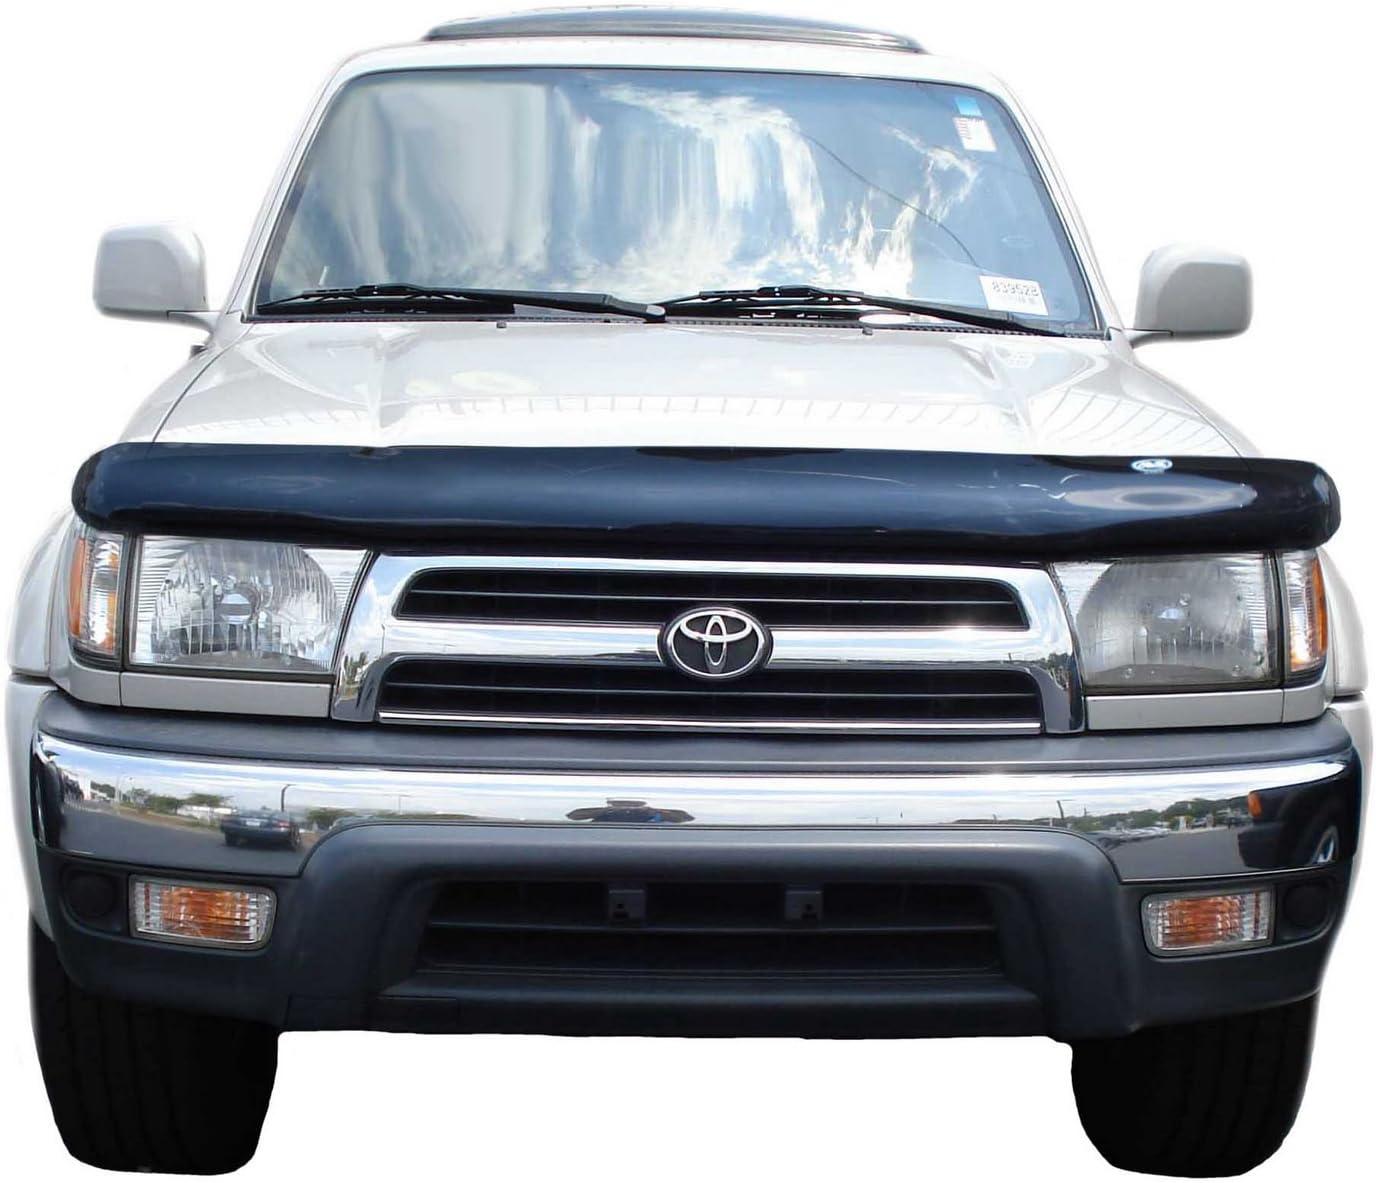 Toyota 4-Runner 1984-1989 Bug Hood Shield Bugshield Deflector Stone